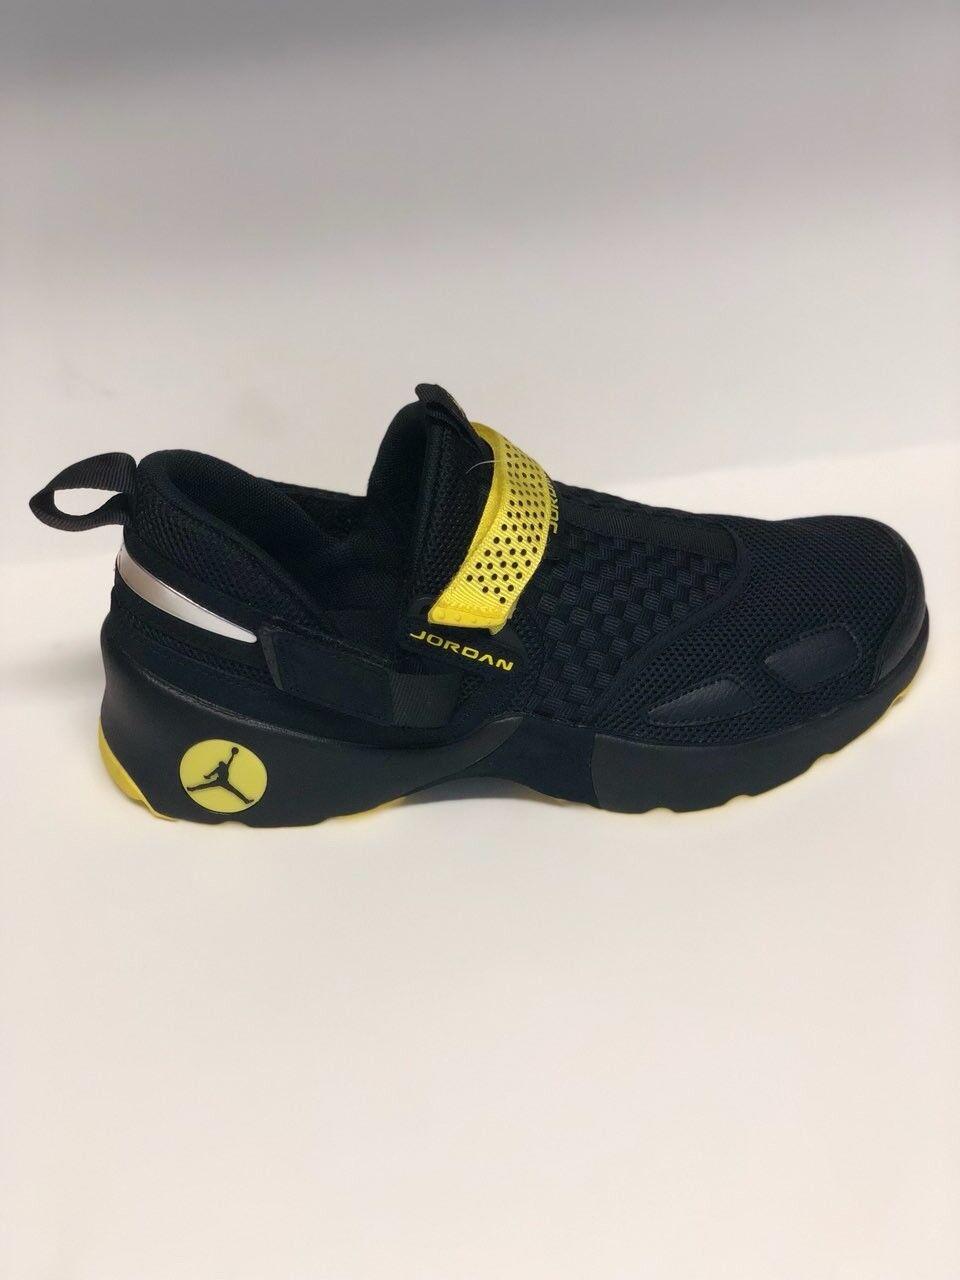 New Nike Air Jordan Trunner LX Thunder 10 Black Opti Yellow Size 10 Thunder (897992-031) Gp b8dee0